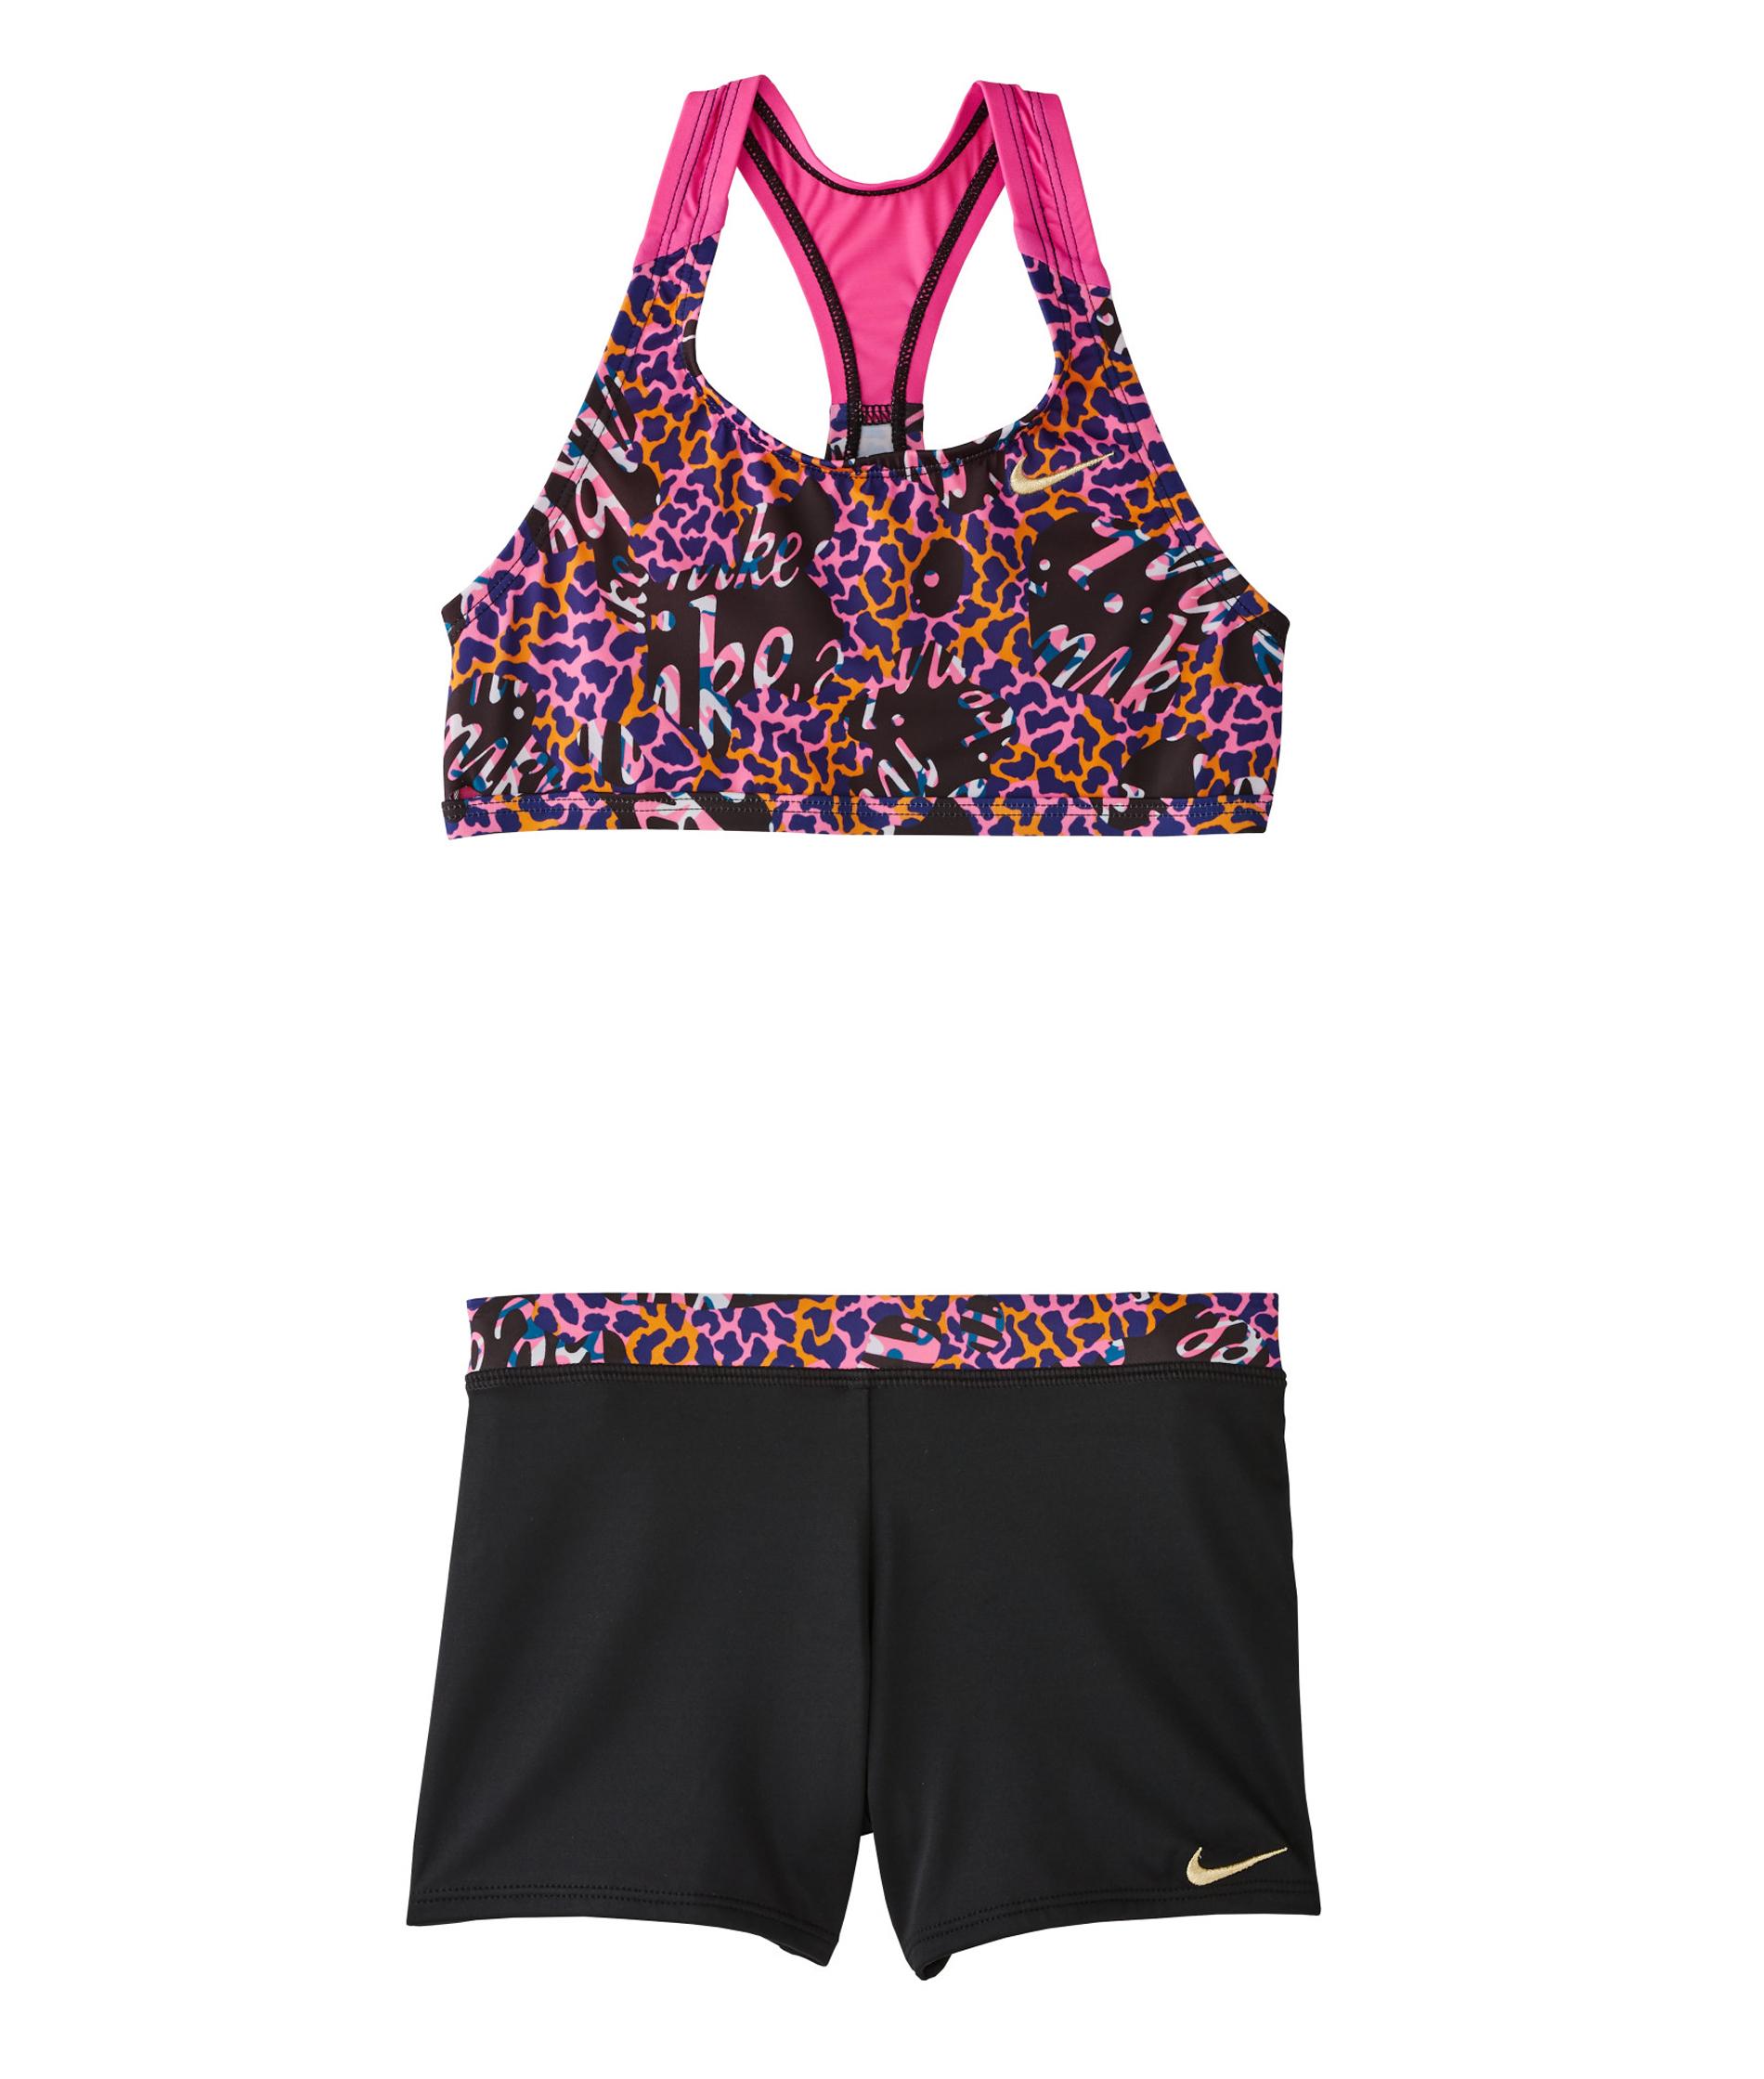 Nike Swim Girls Racerback Sport Bikini - Black